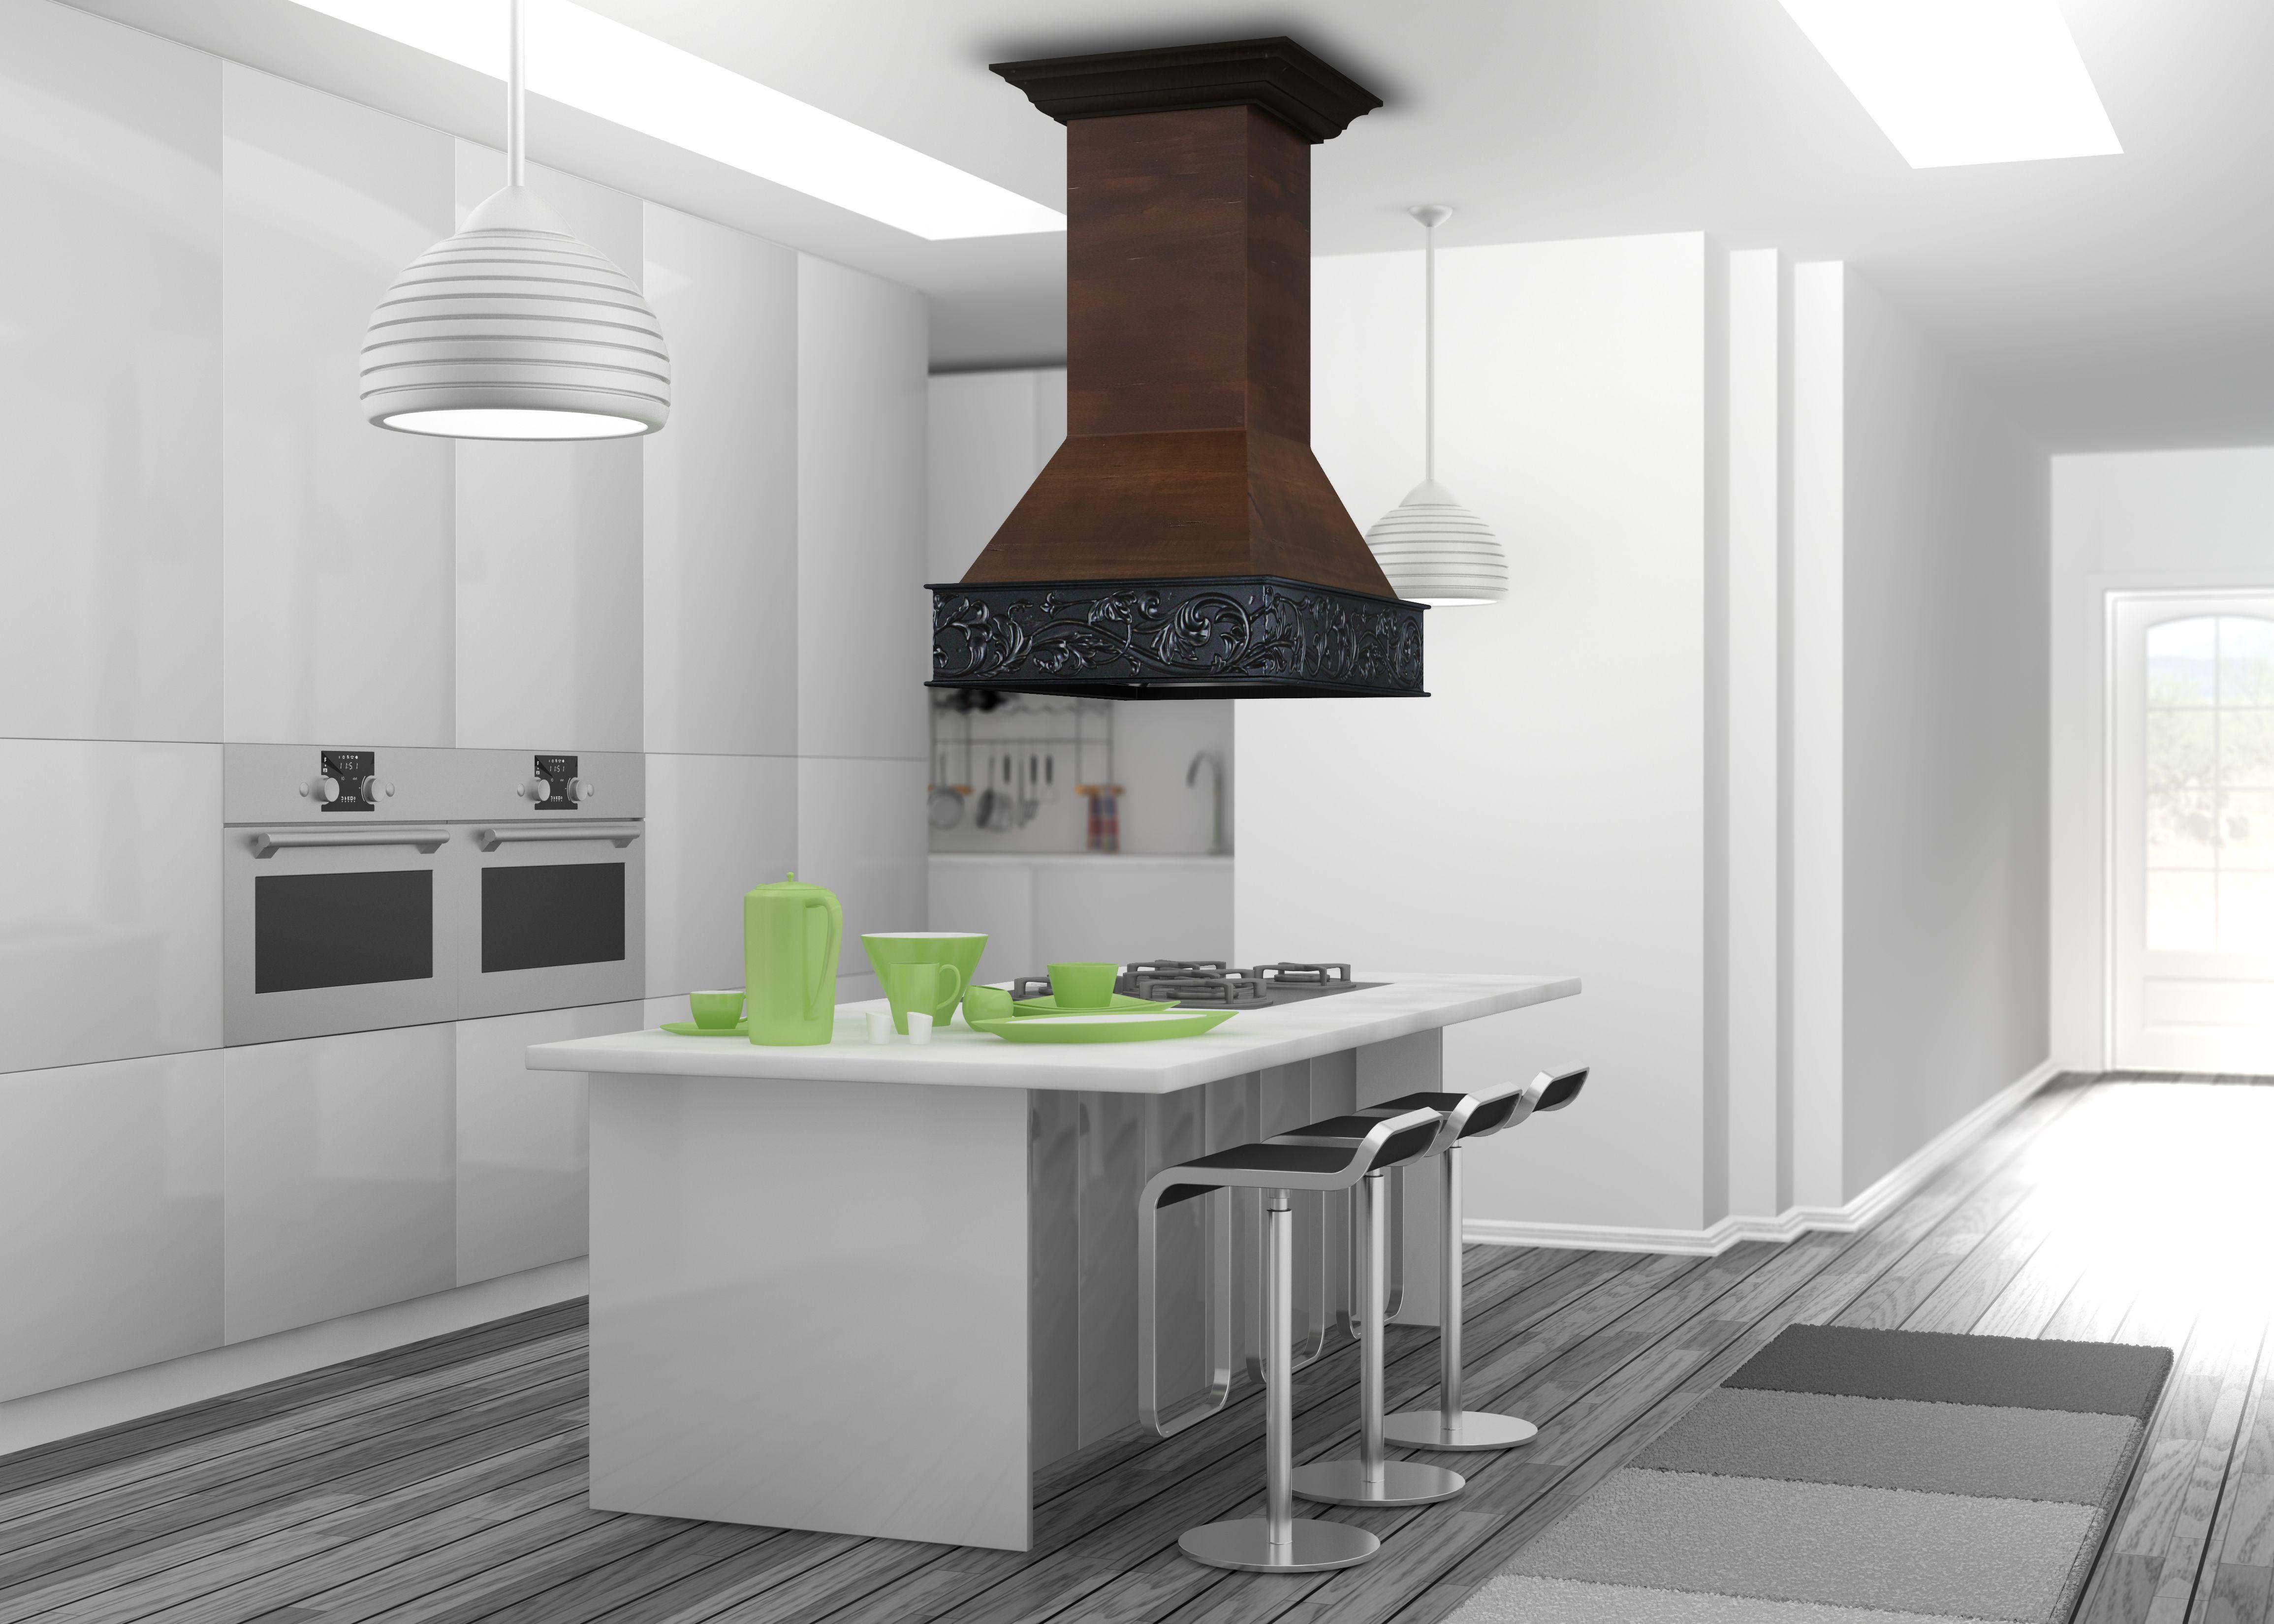 "ZLINE 36"" Designer Series Wooden Island Range Hood with"